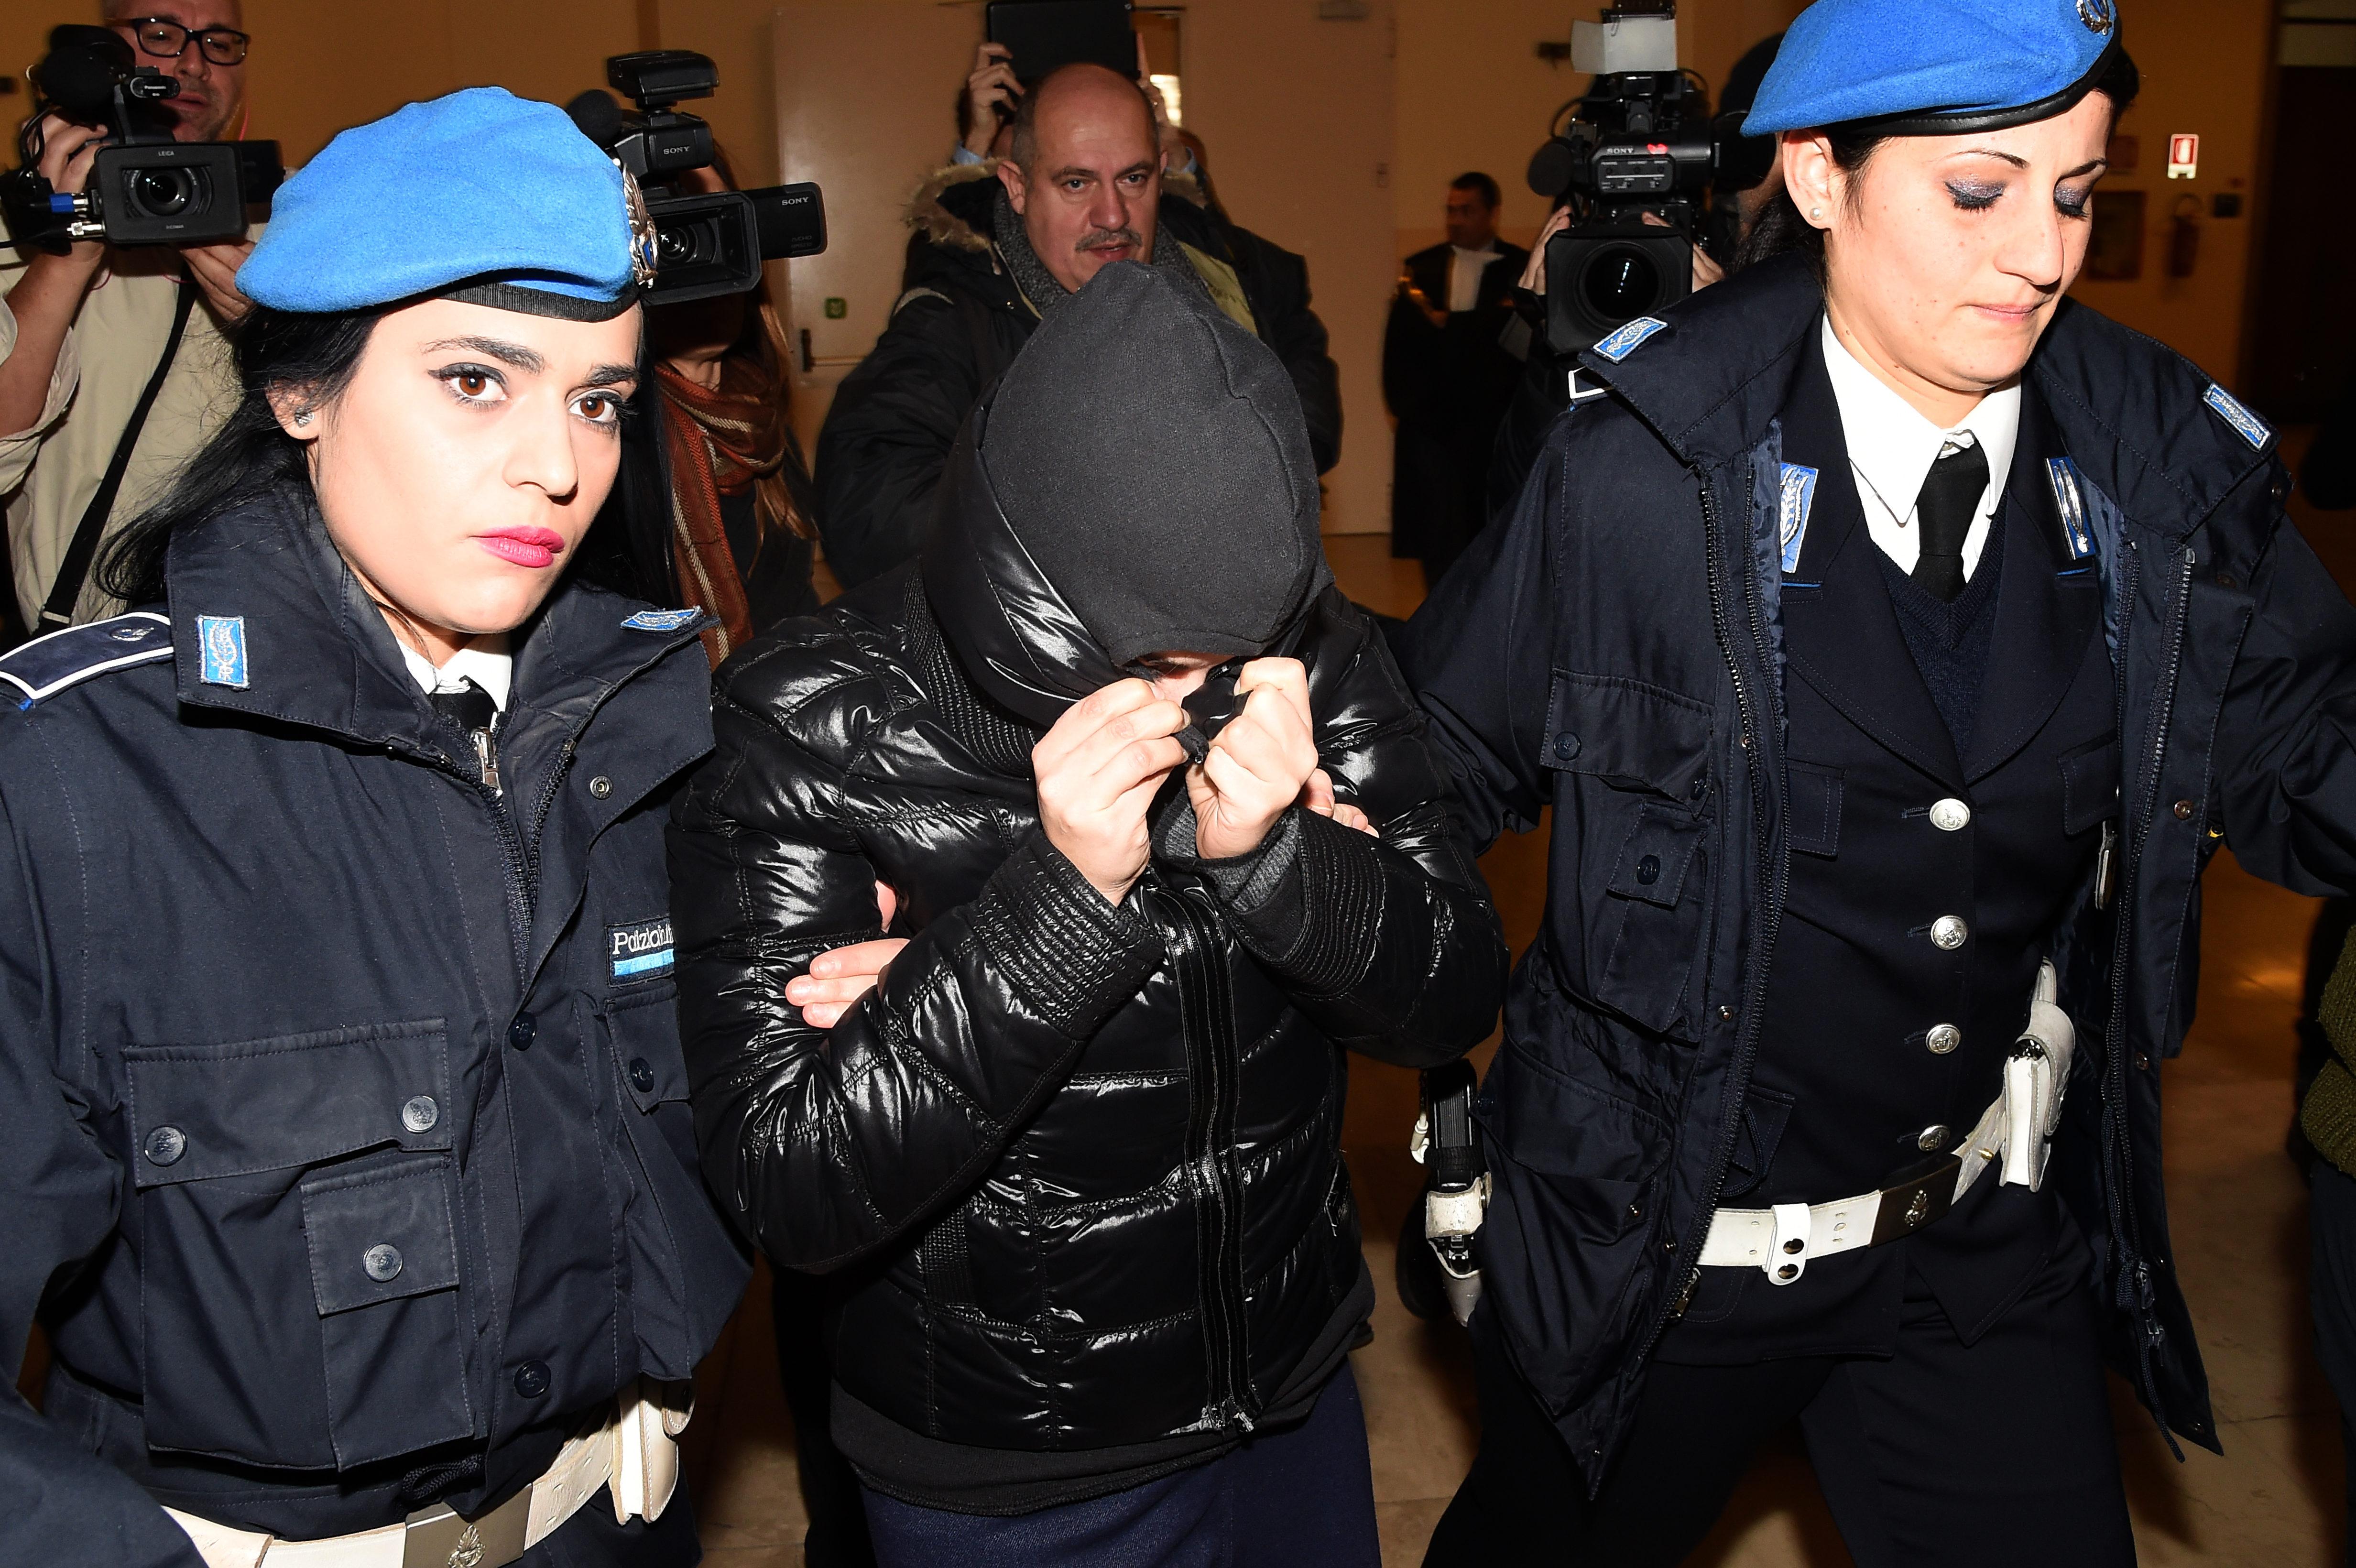 processo a Martina Levato e Alexander Boettecher